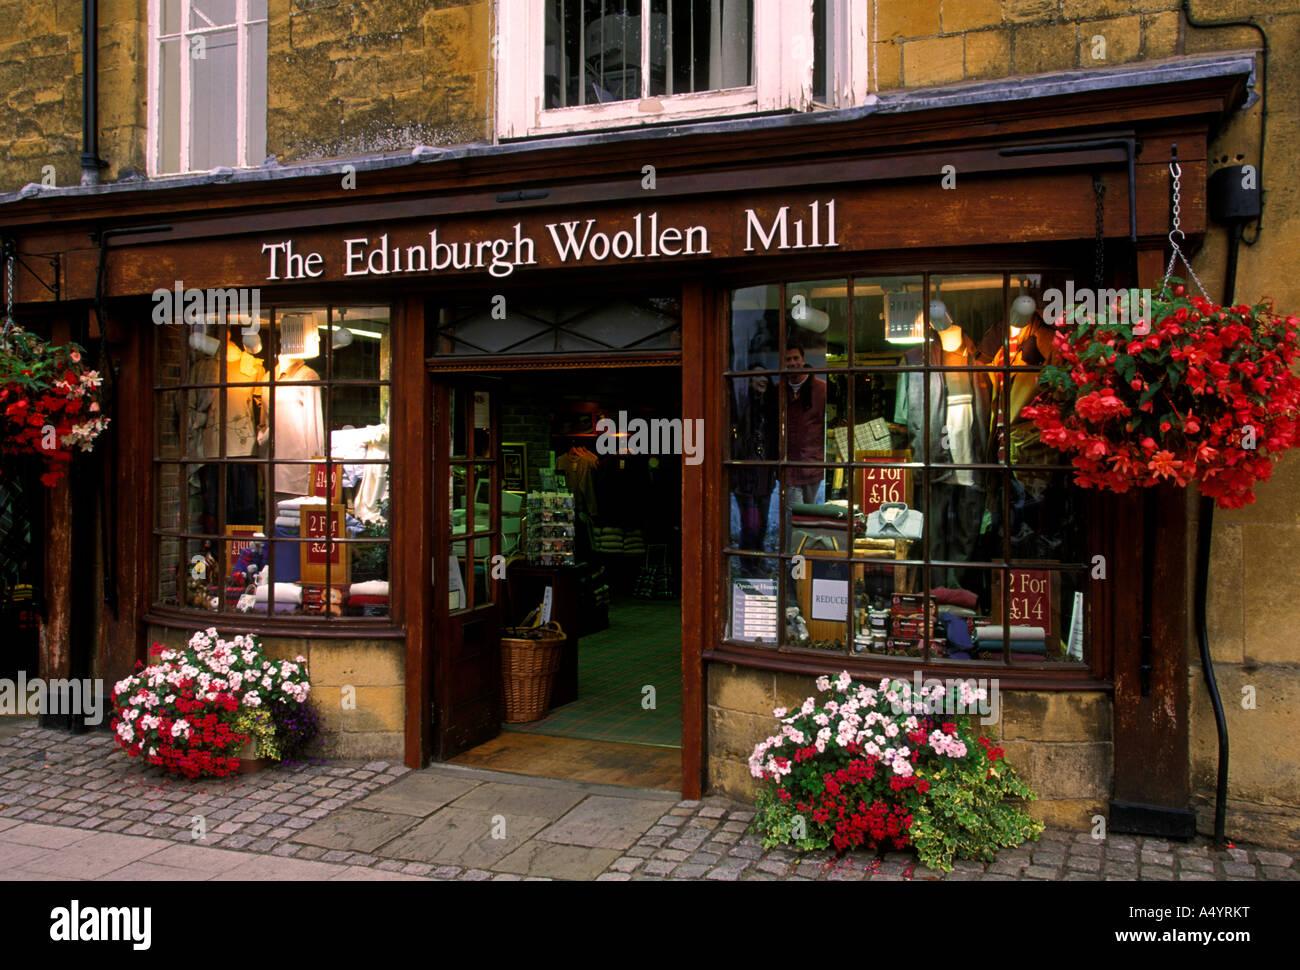 Storefront Store Gift Shop Shop Shopping The Edinburgh Woollen Stock Photo Alamy